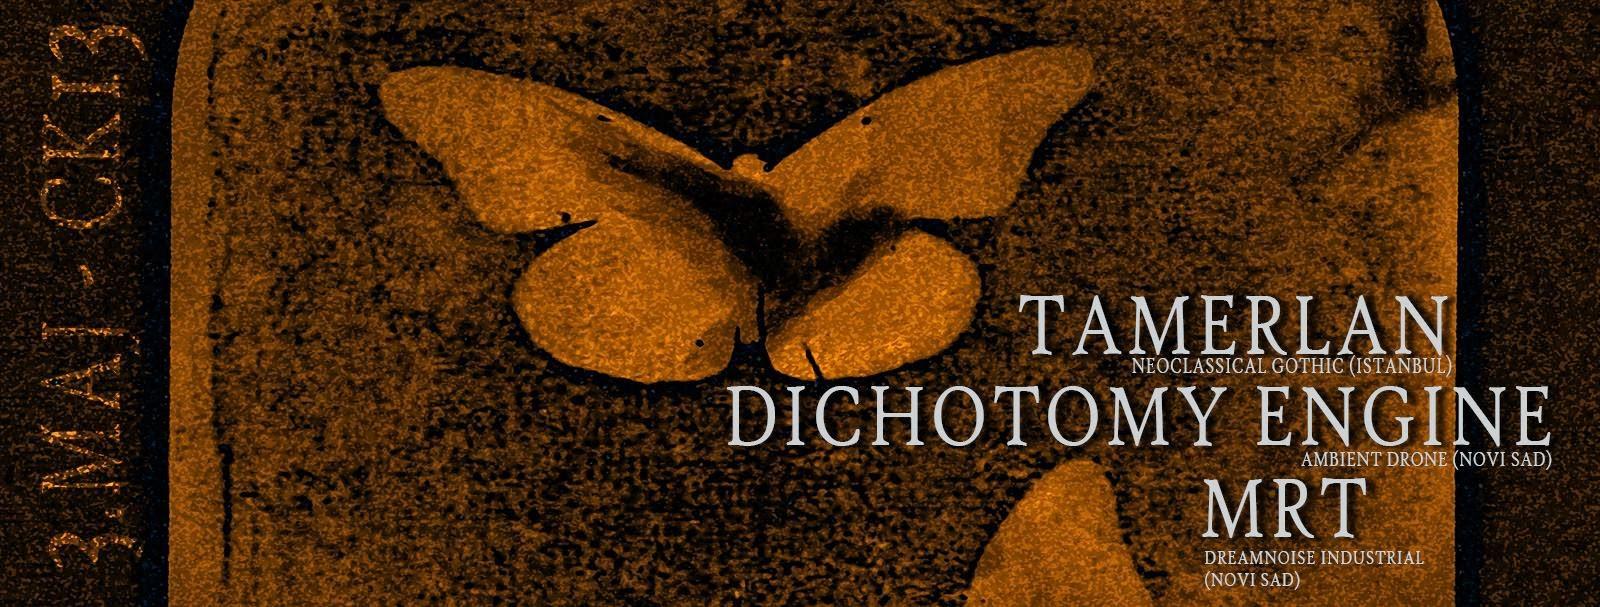 Dichotomy Engine gig with Tamerlan, MRT